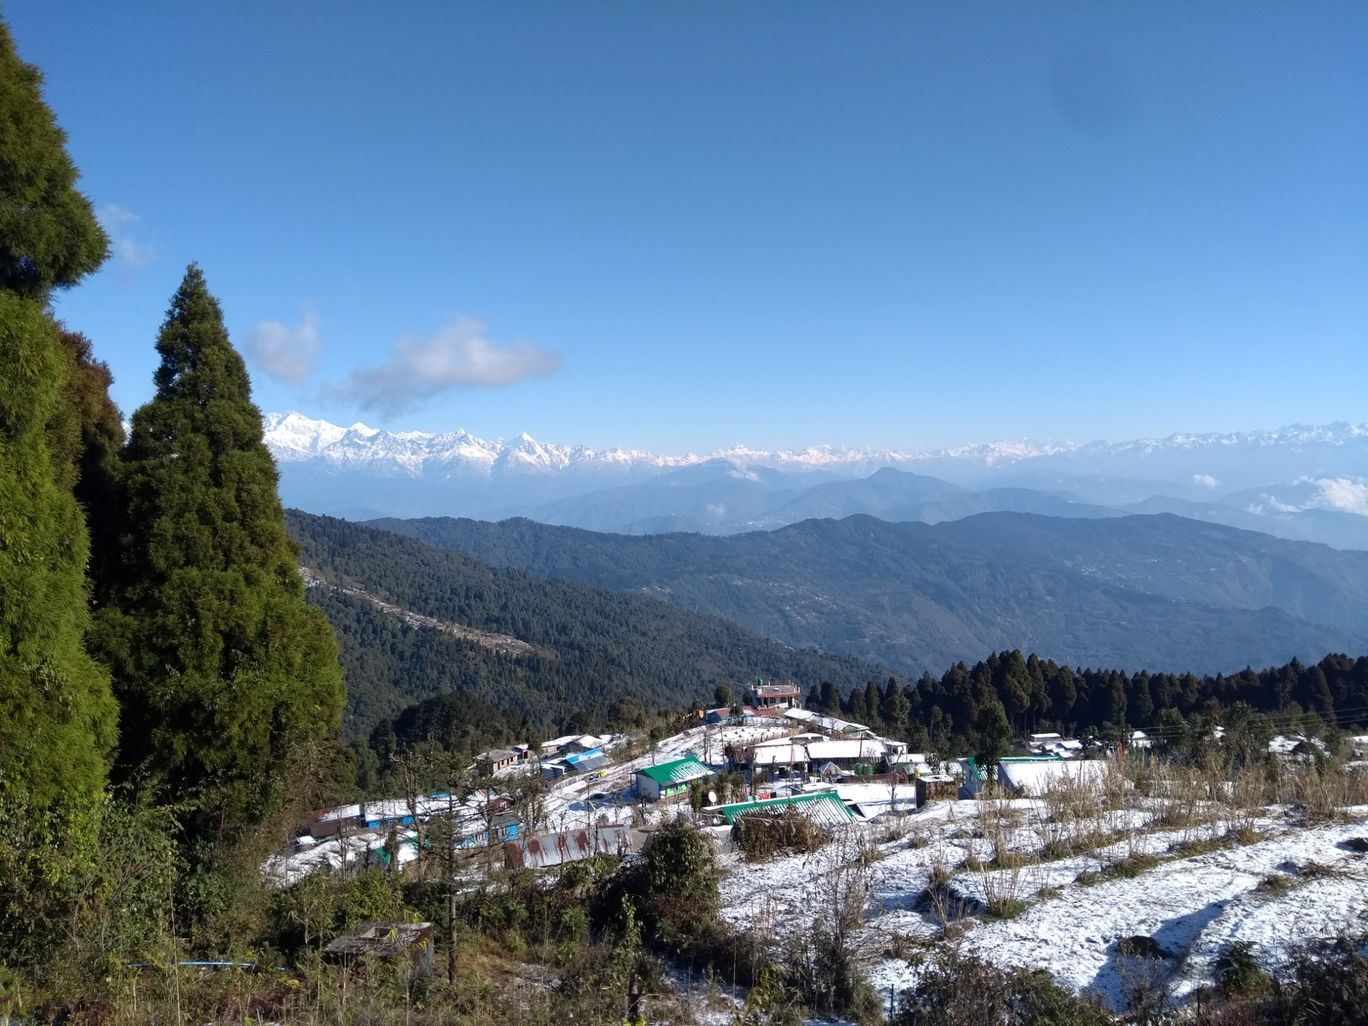 Photo of Chatakpur By Abhishek Bose